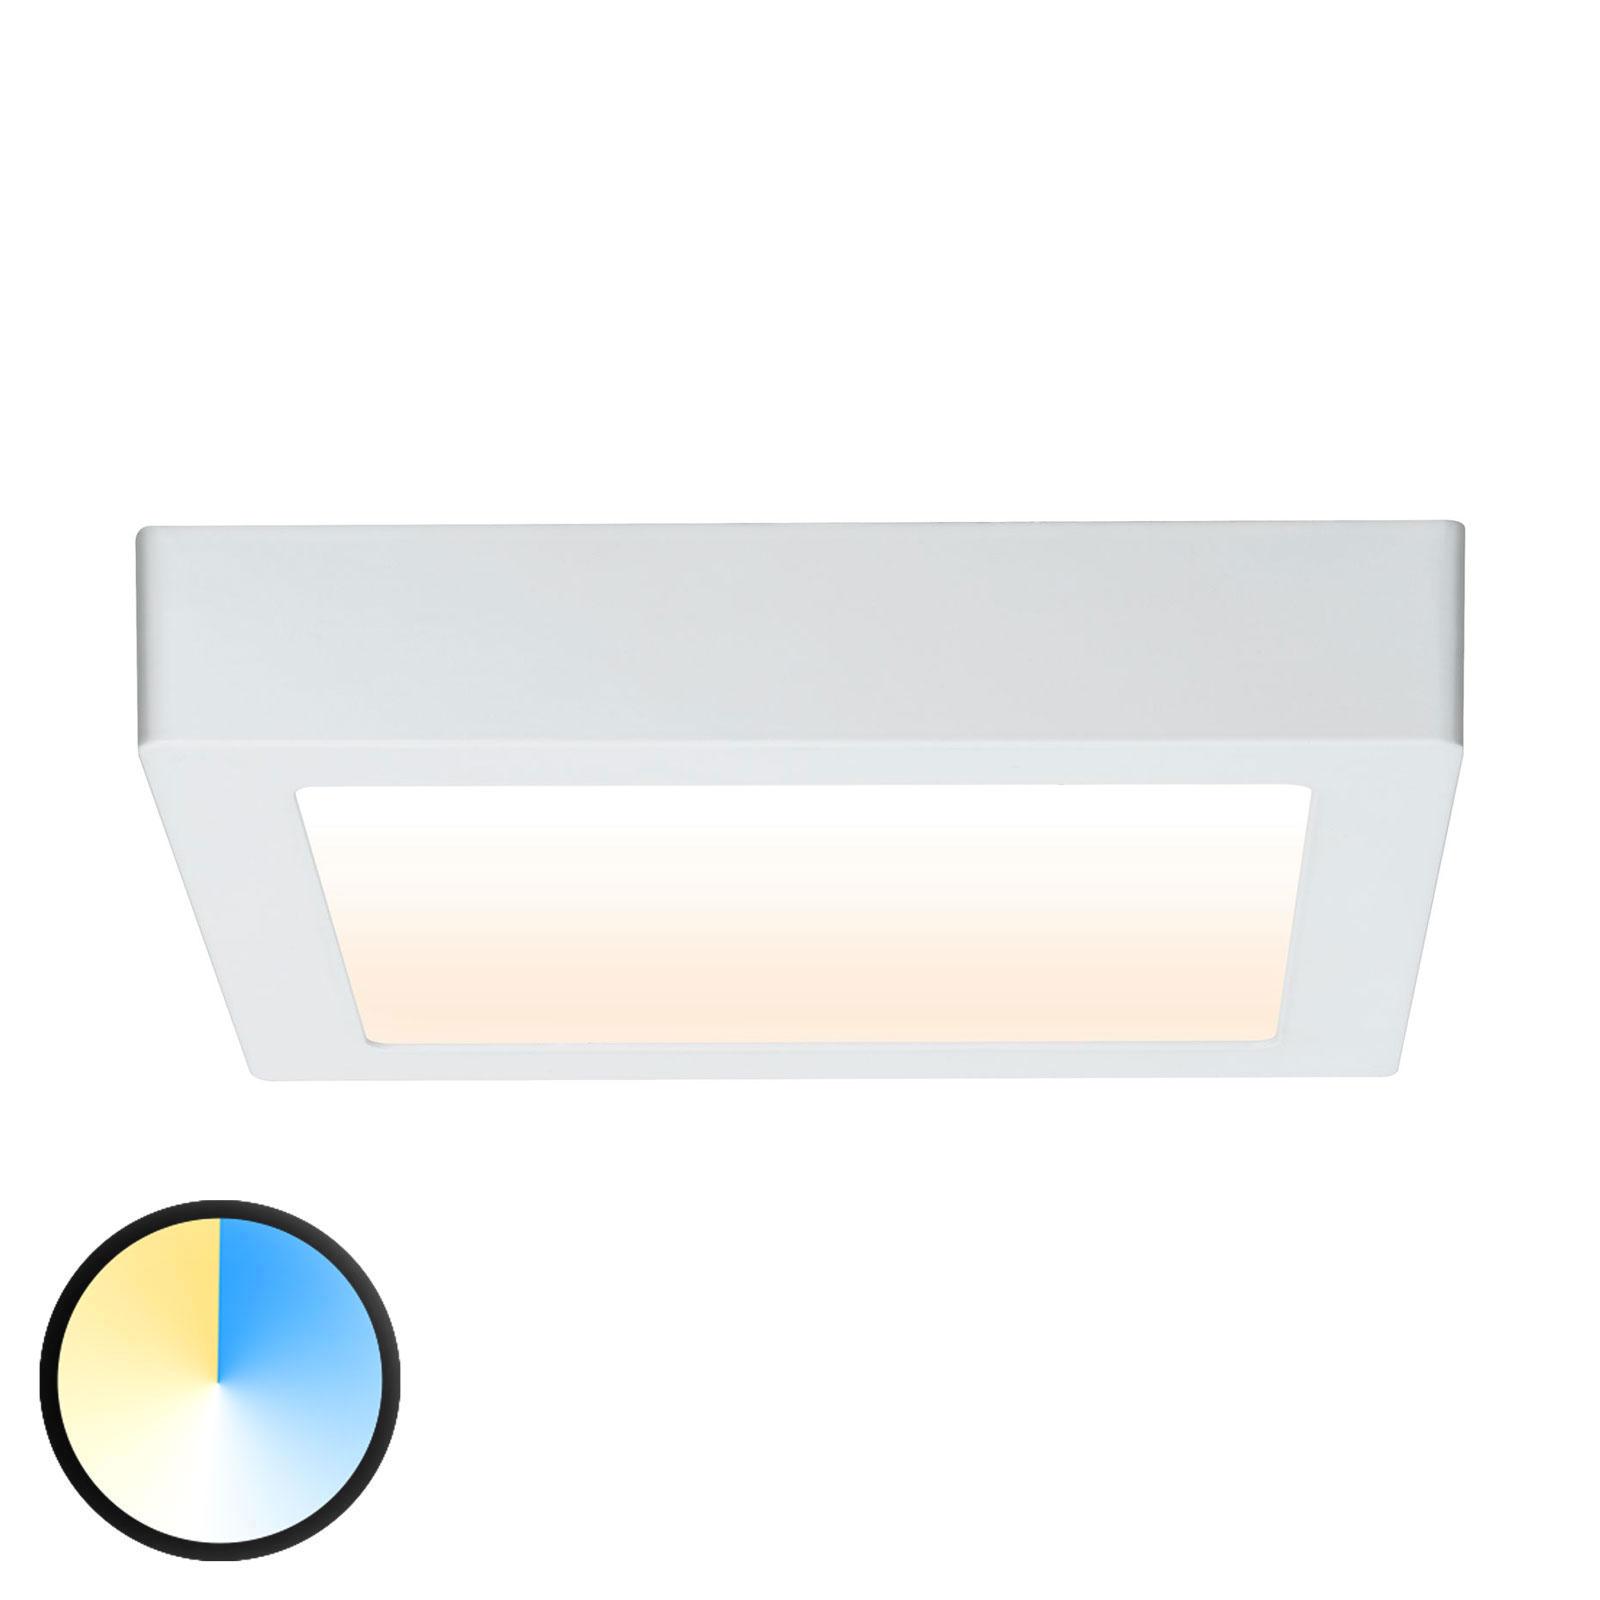 Paulmann Carpo LED plafondlamp wit 22,5x22,5cm